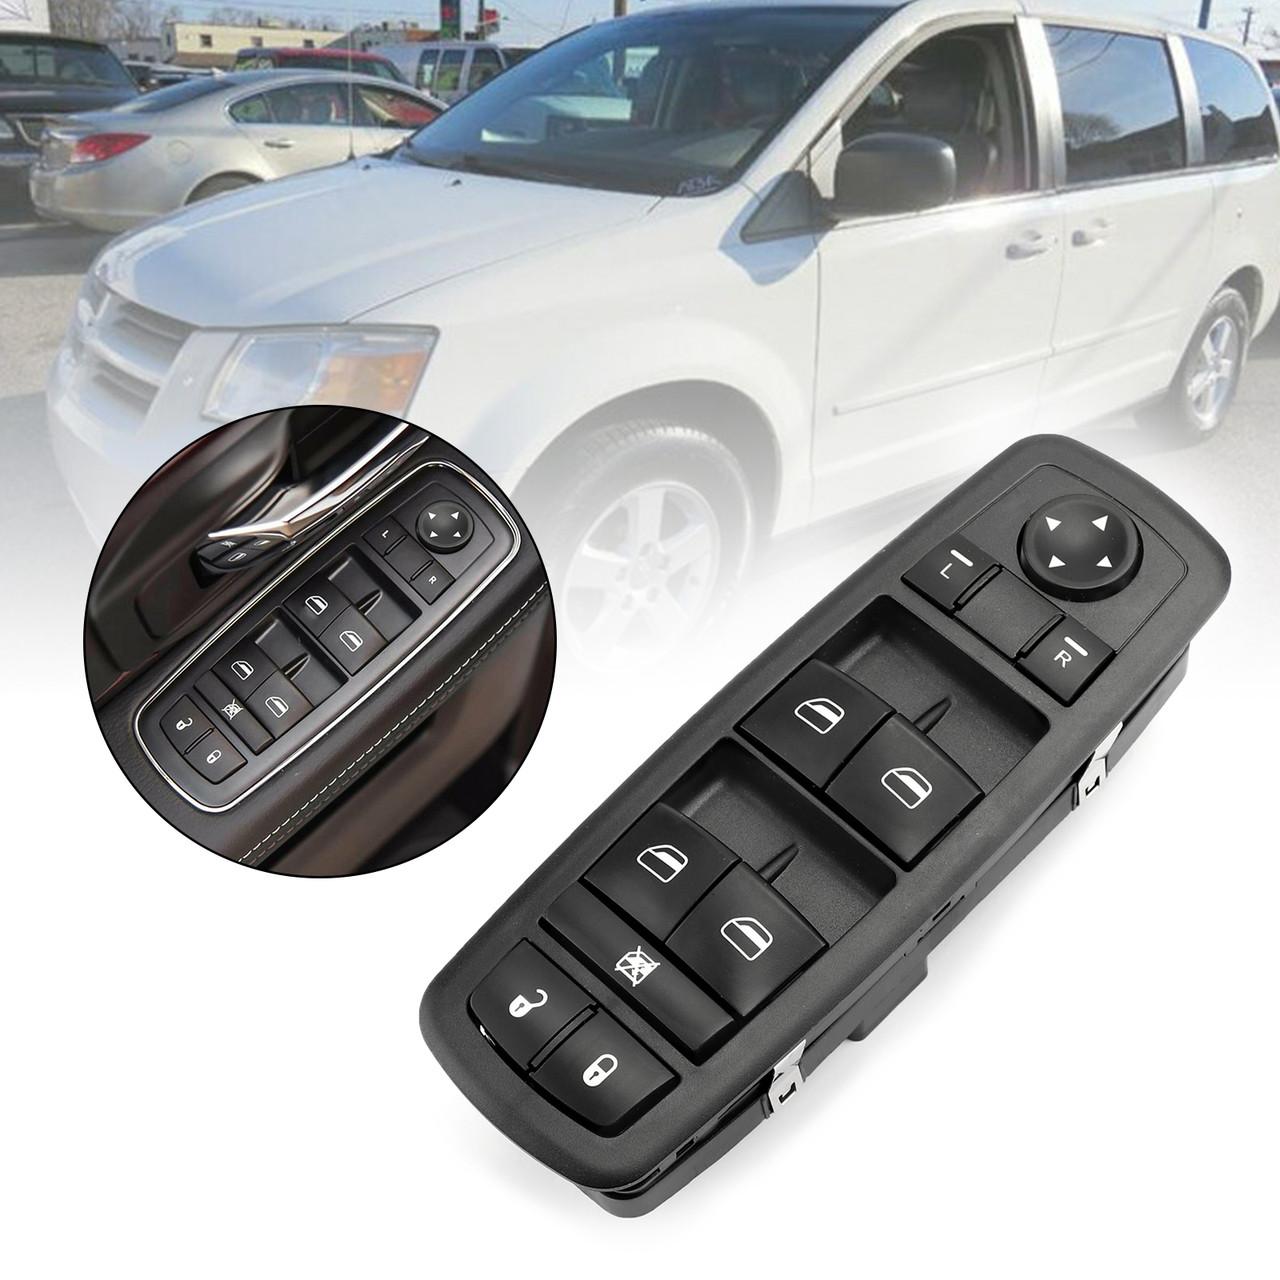 Master Power Window Switch For Dodge Grand Caravan Chrysler Ram 2500 3500 68039999AA 68039999AB 68039999AC